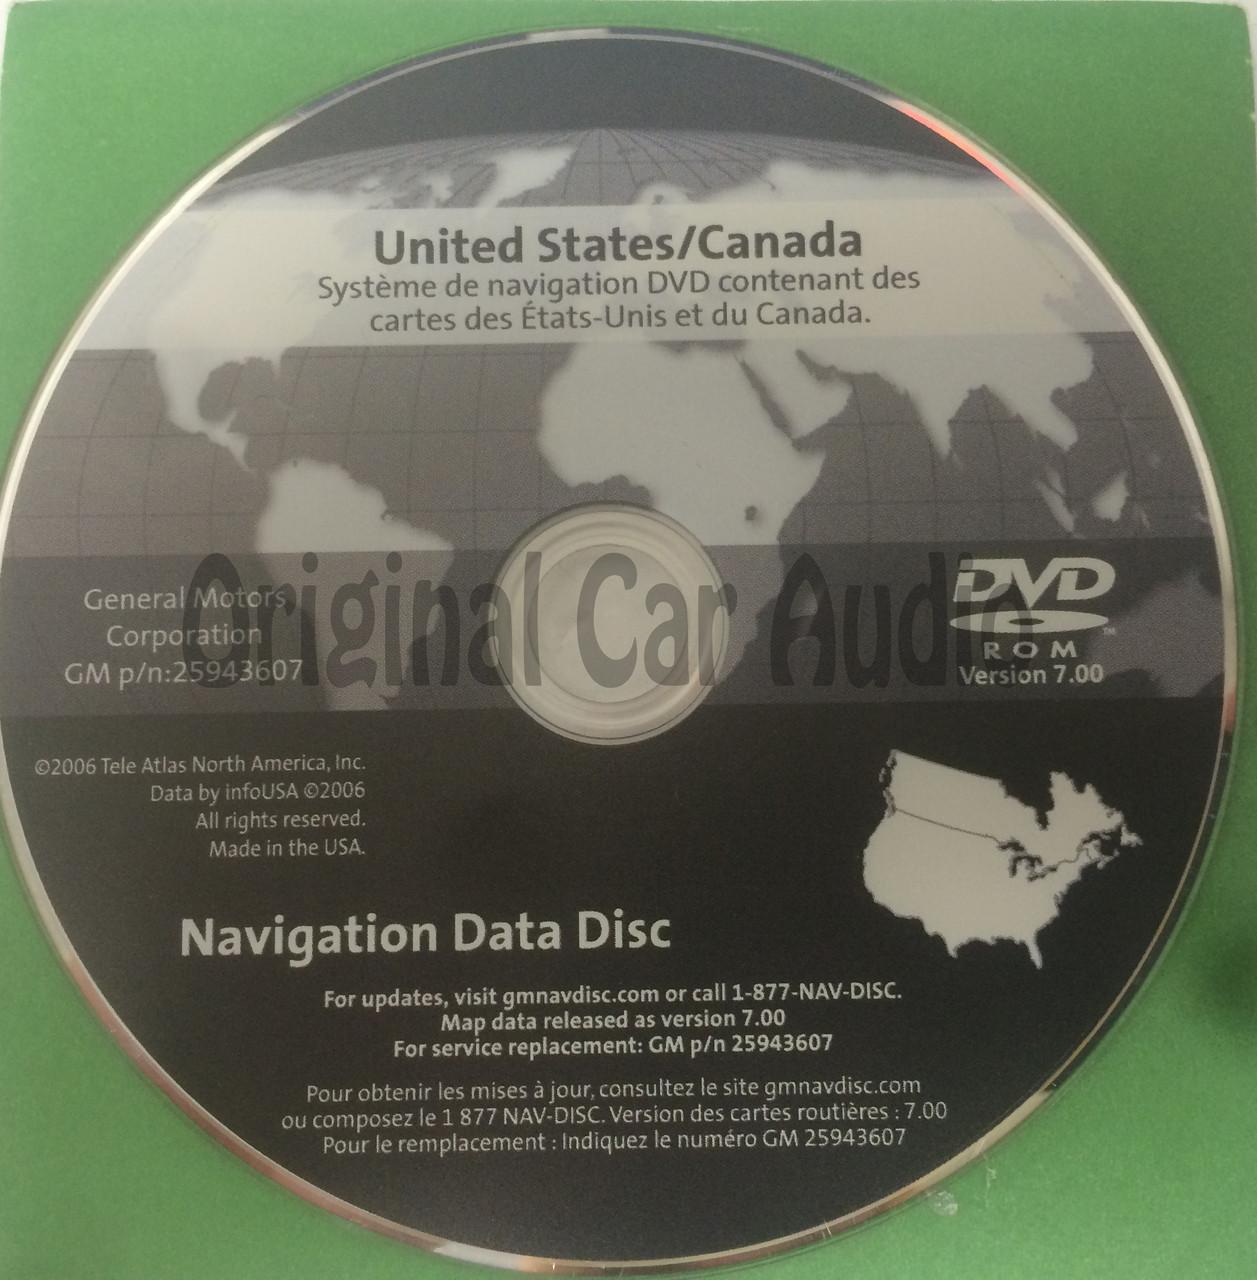 GM Satellite Navigation System GPS DVD Drive Disc 25943607 Version 7 0